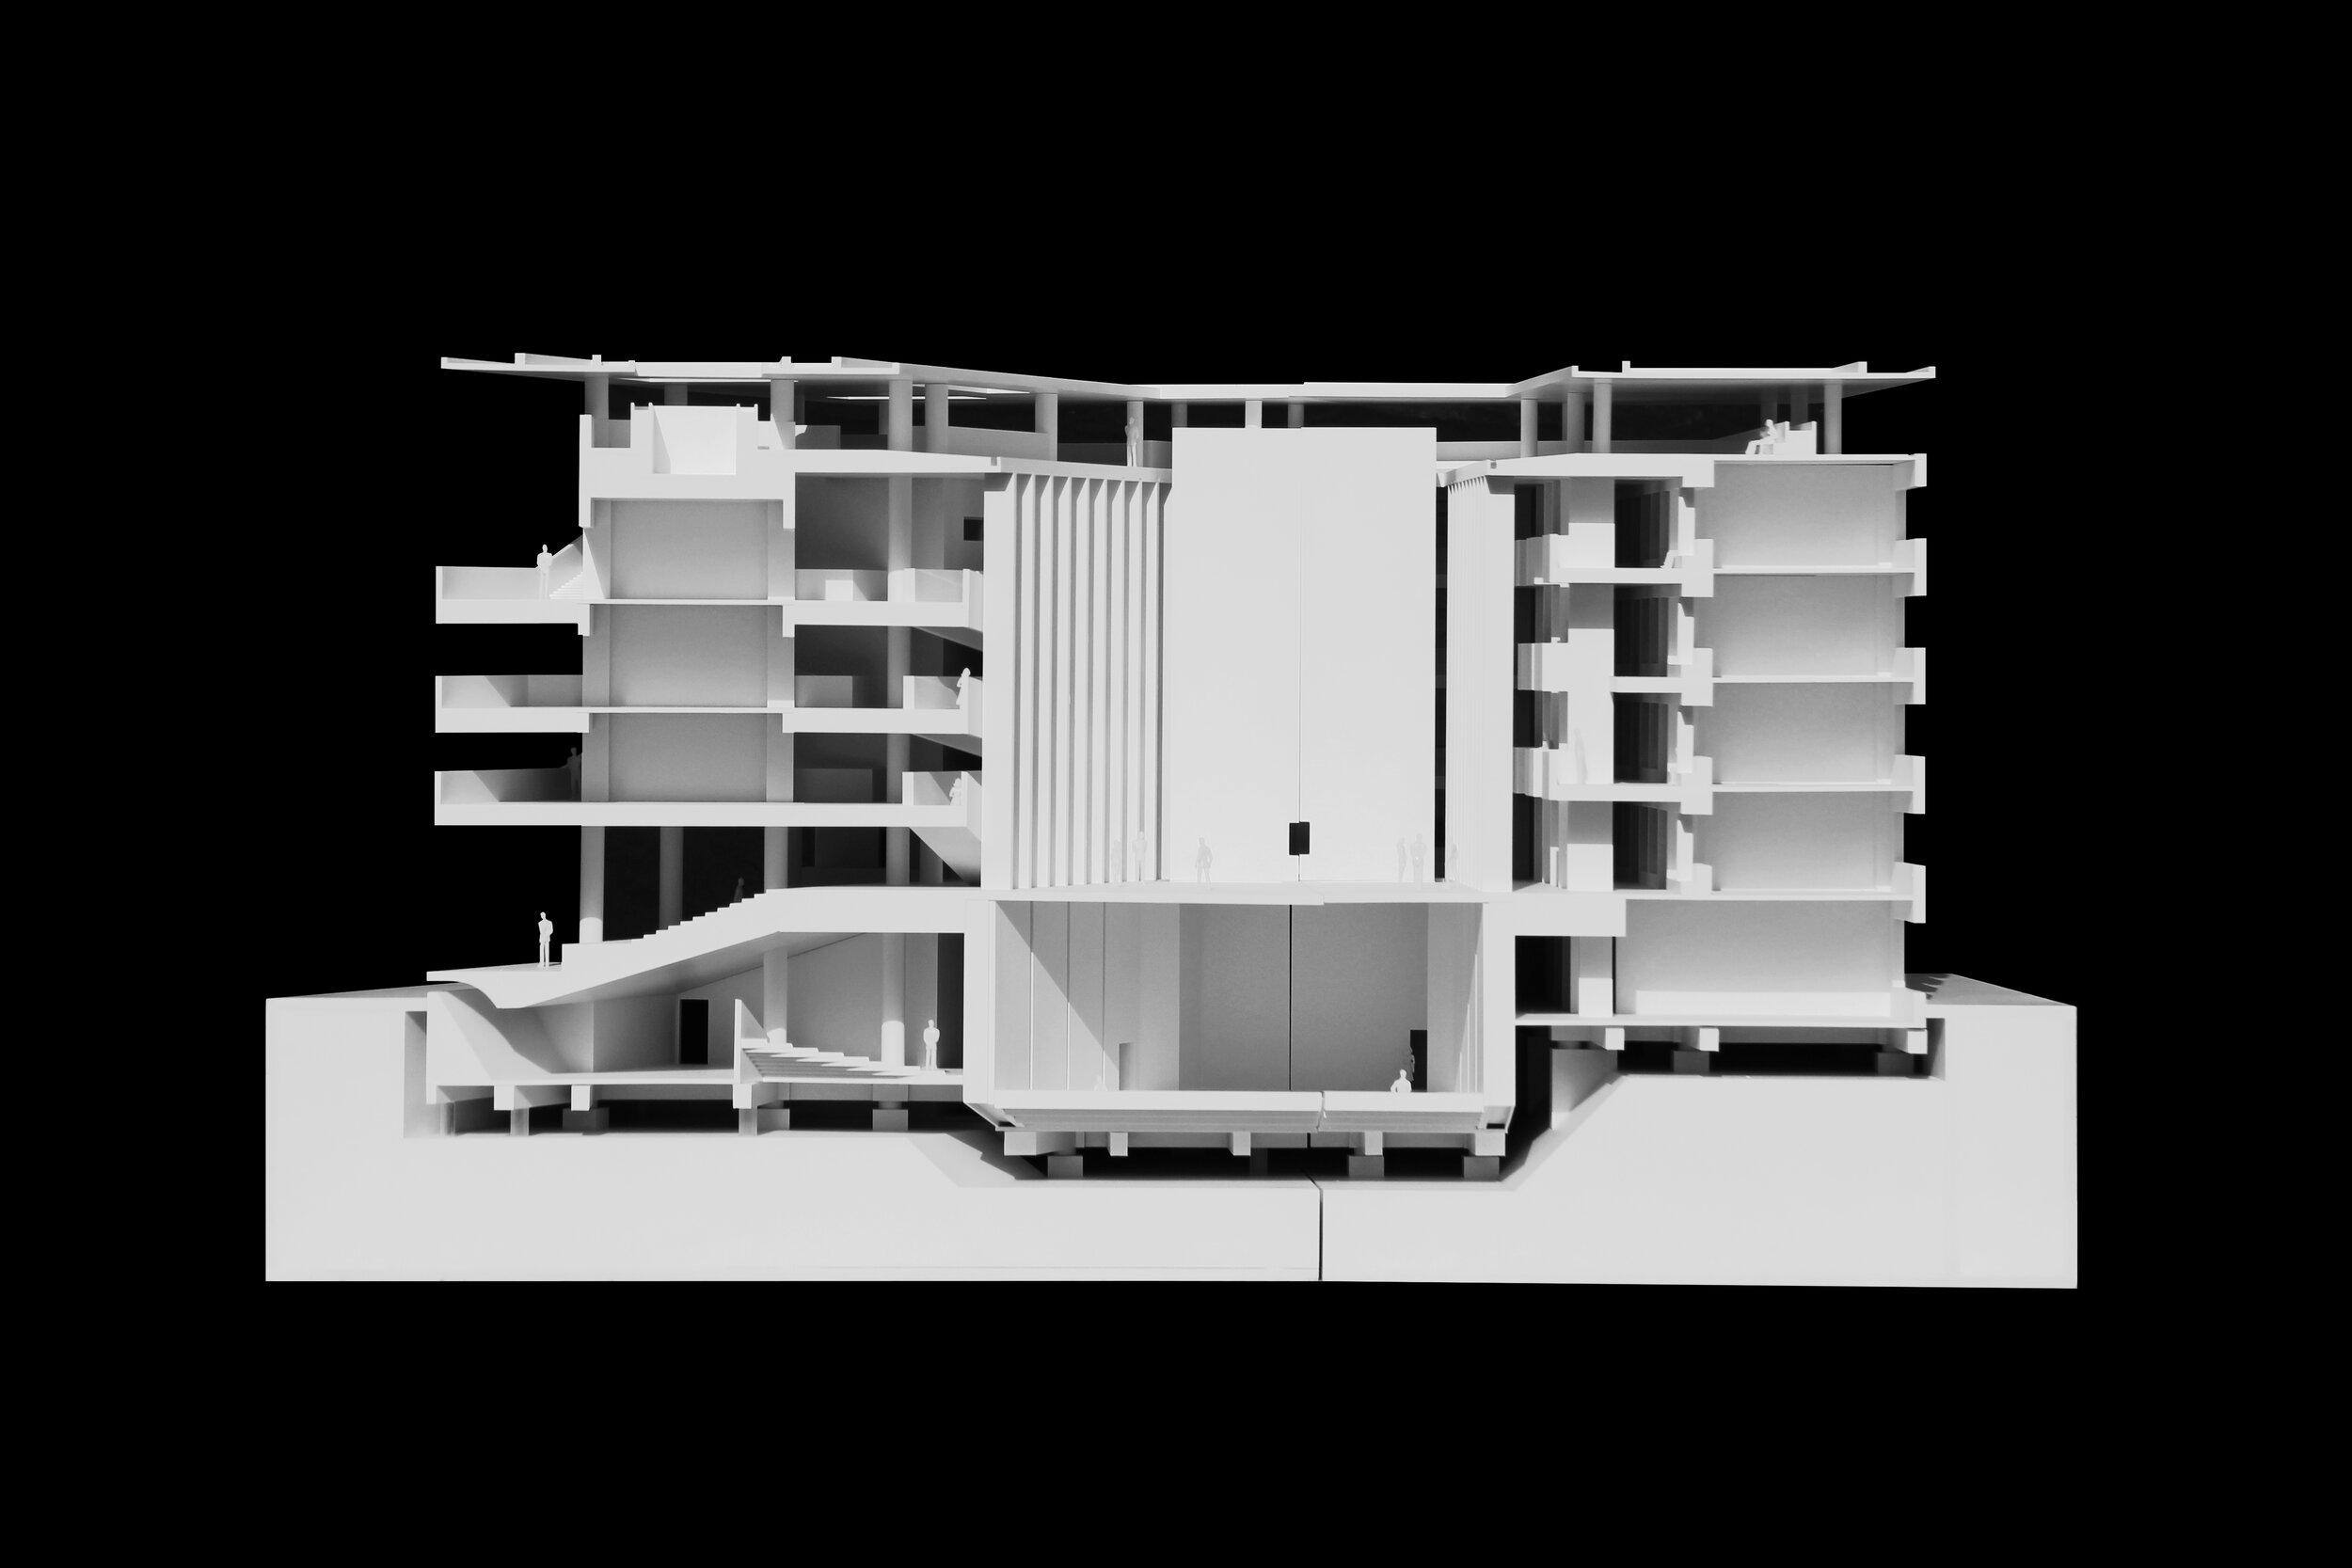 1比100教學樓剖面模型 02 1 to 100 teaching block section model 02.jpg